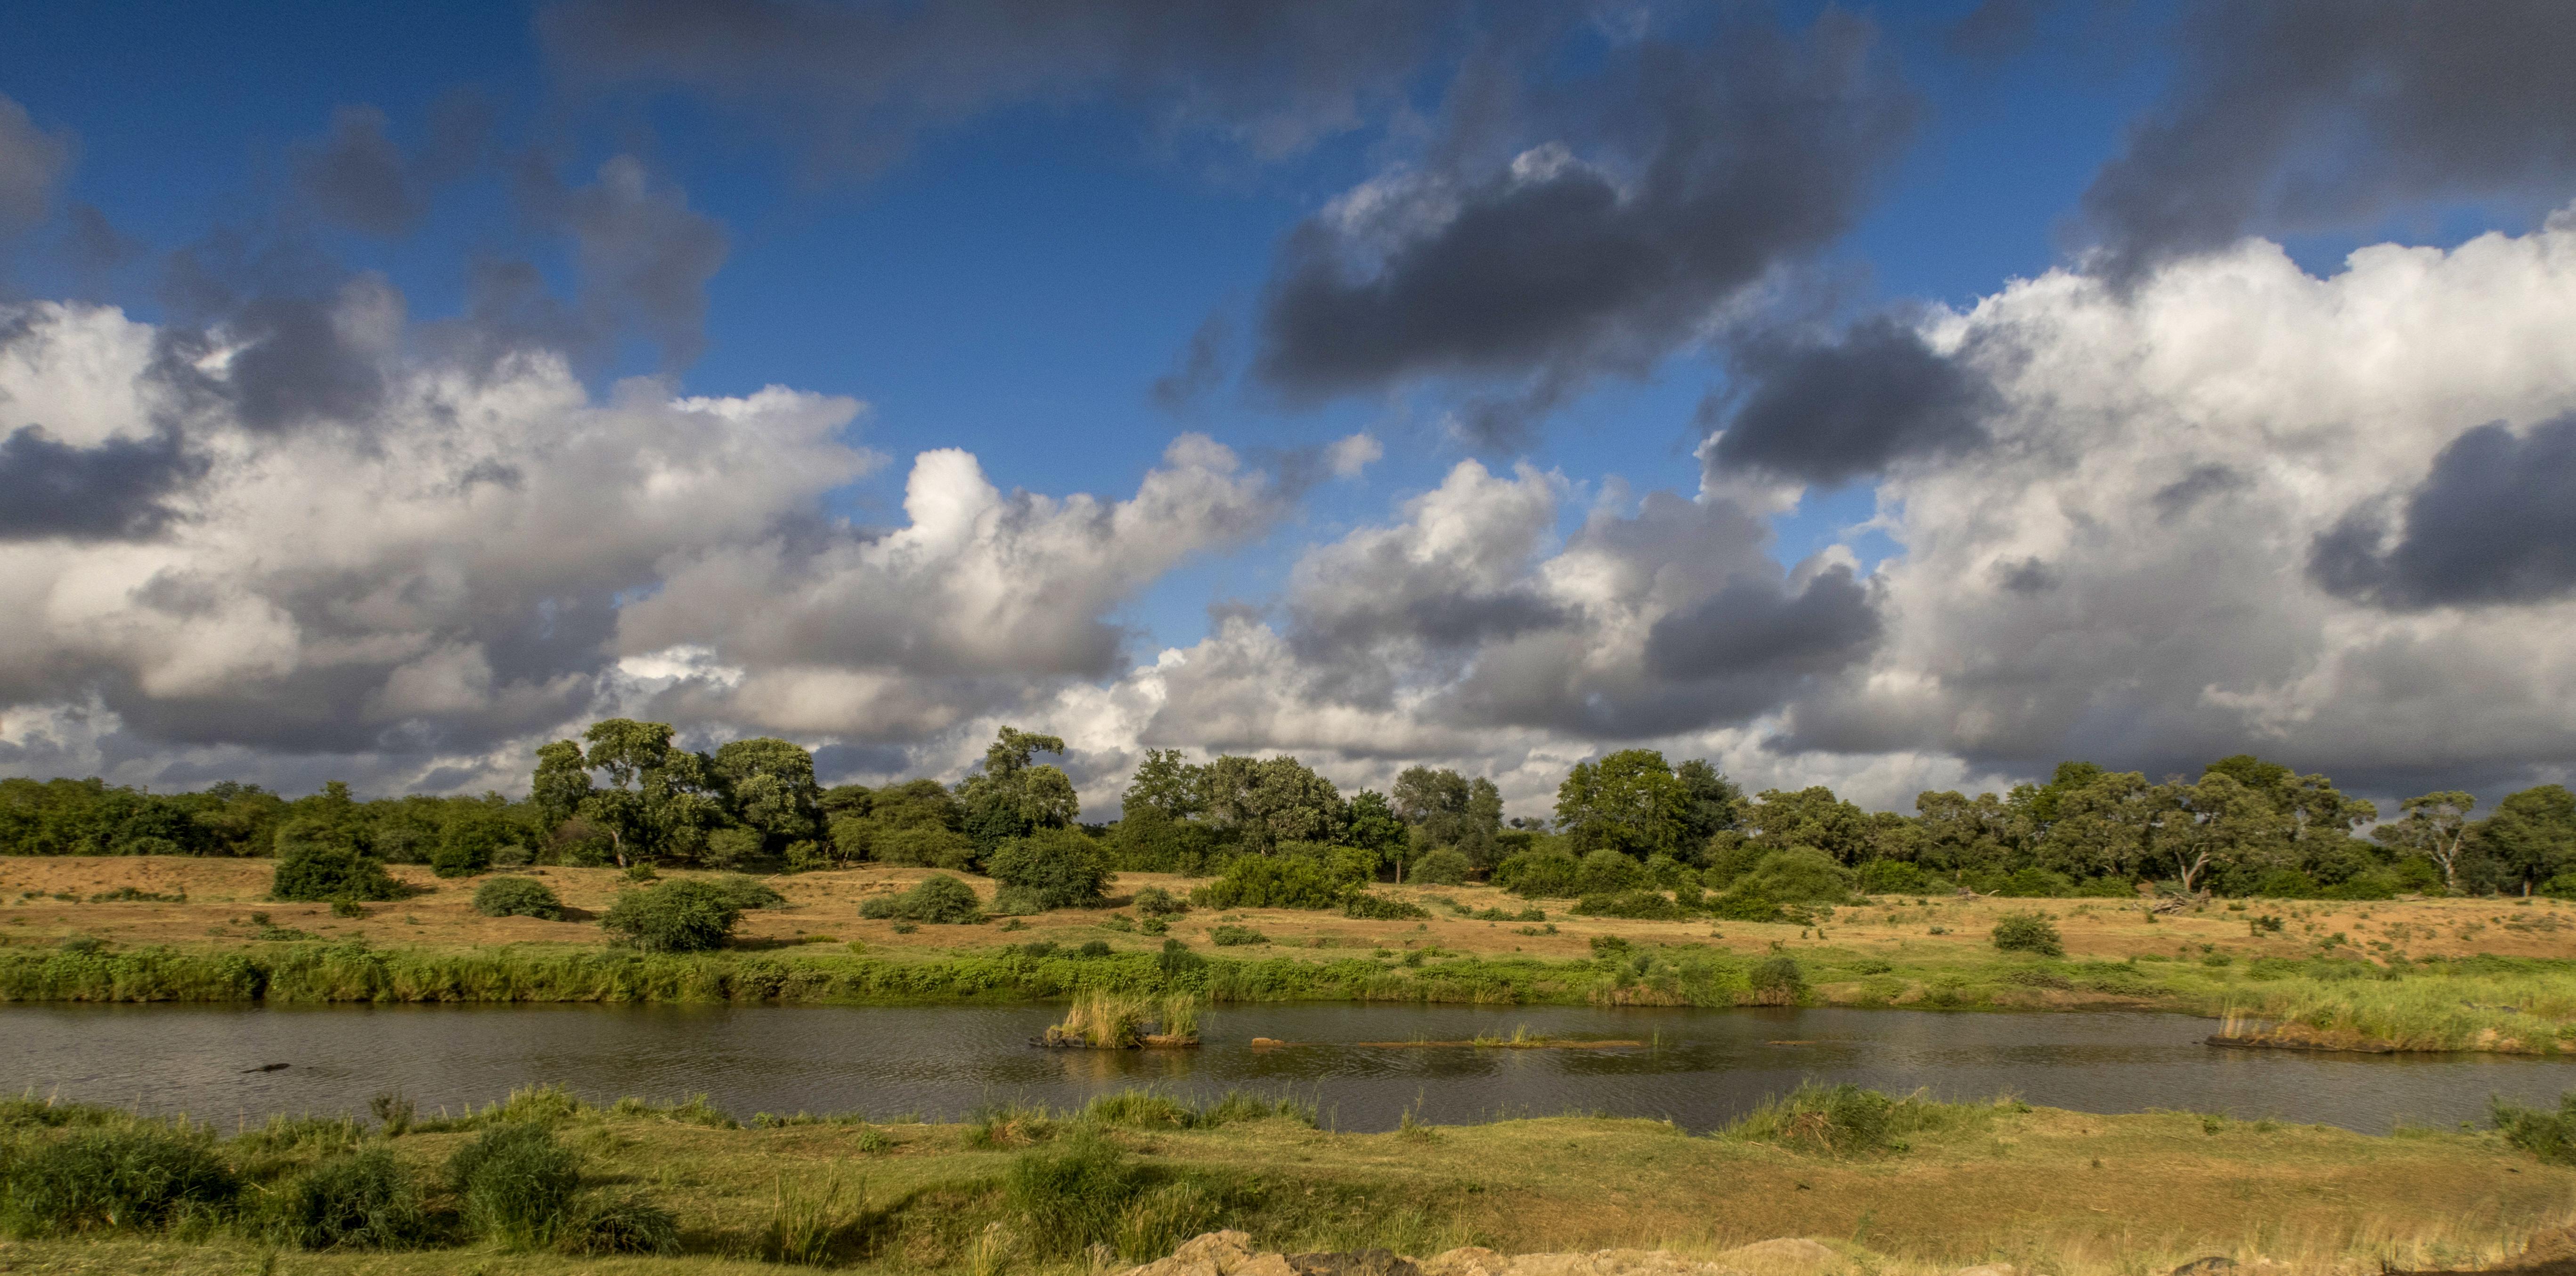 Suedafrika-Mtomeni-Flusslandschaft